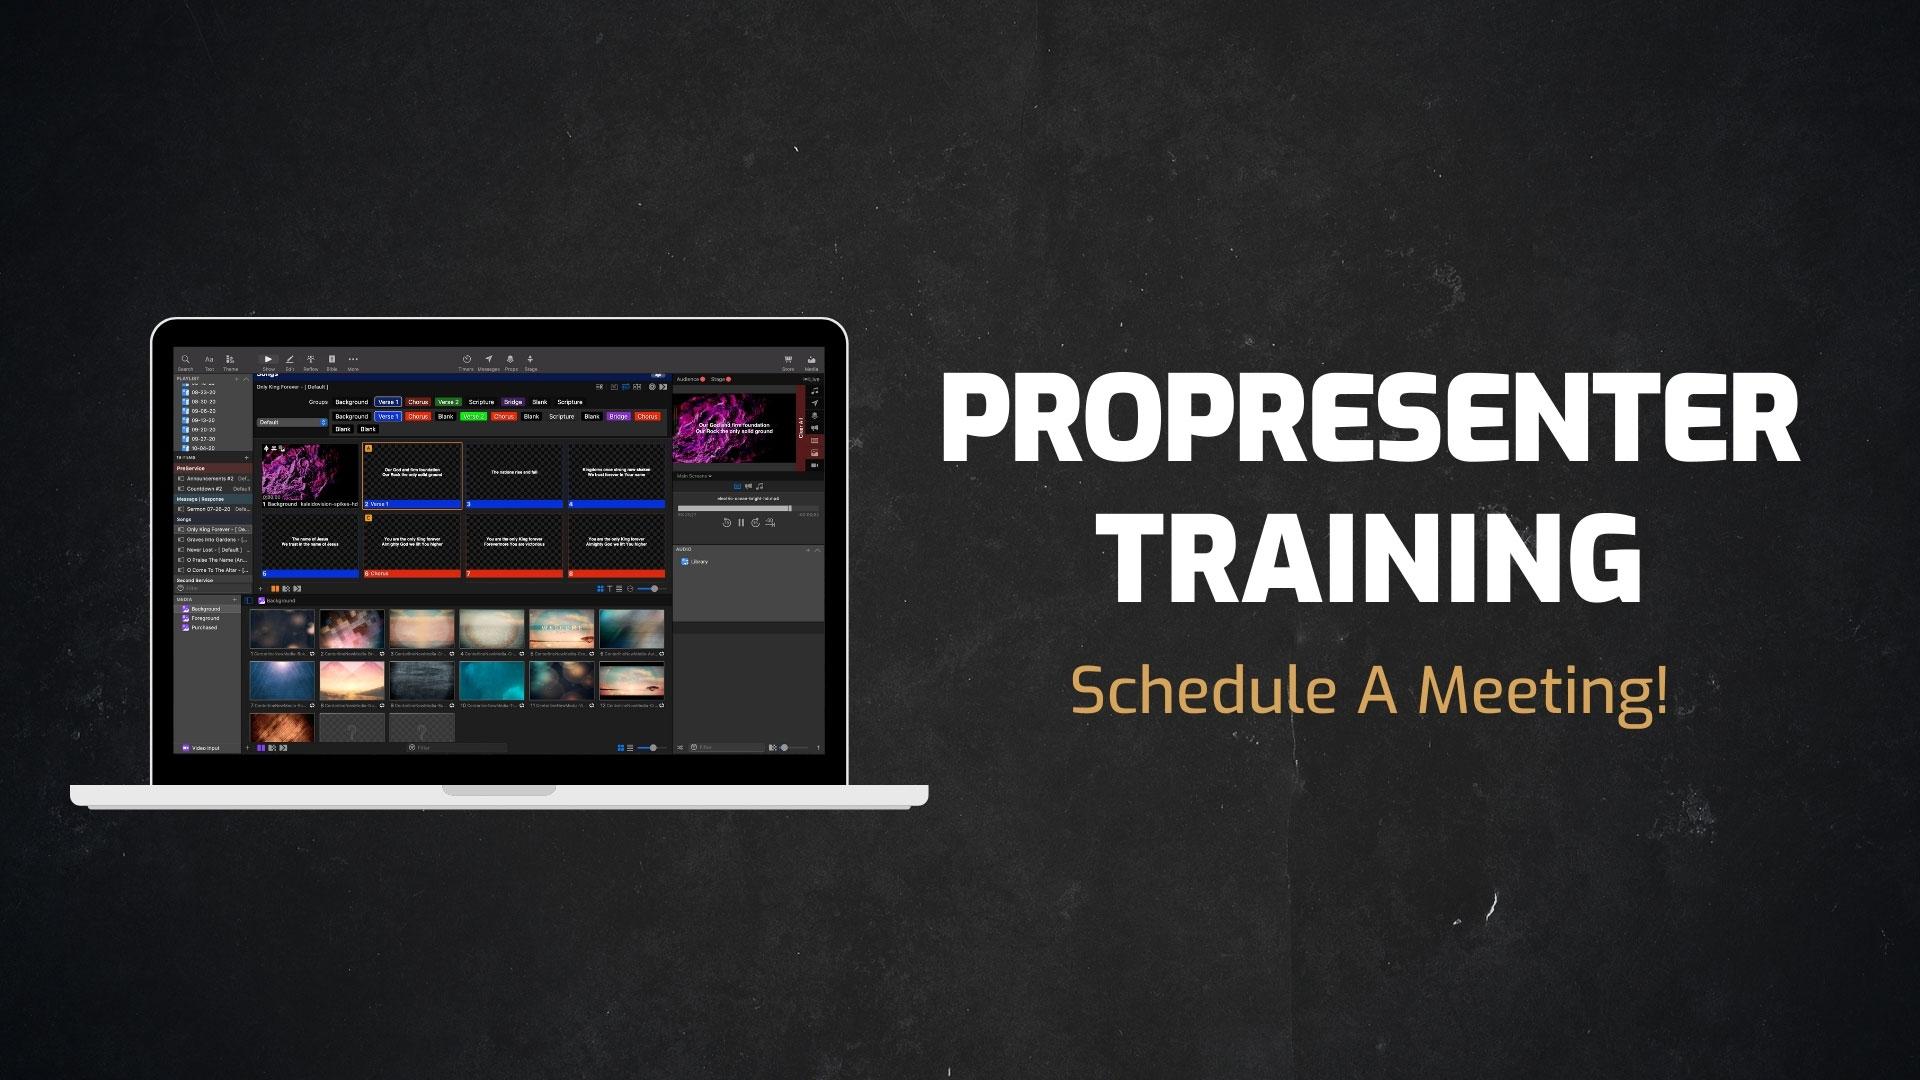 Propresenter Training